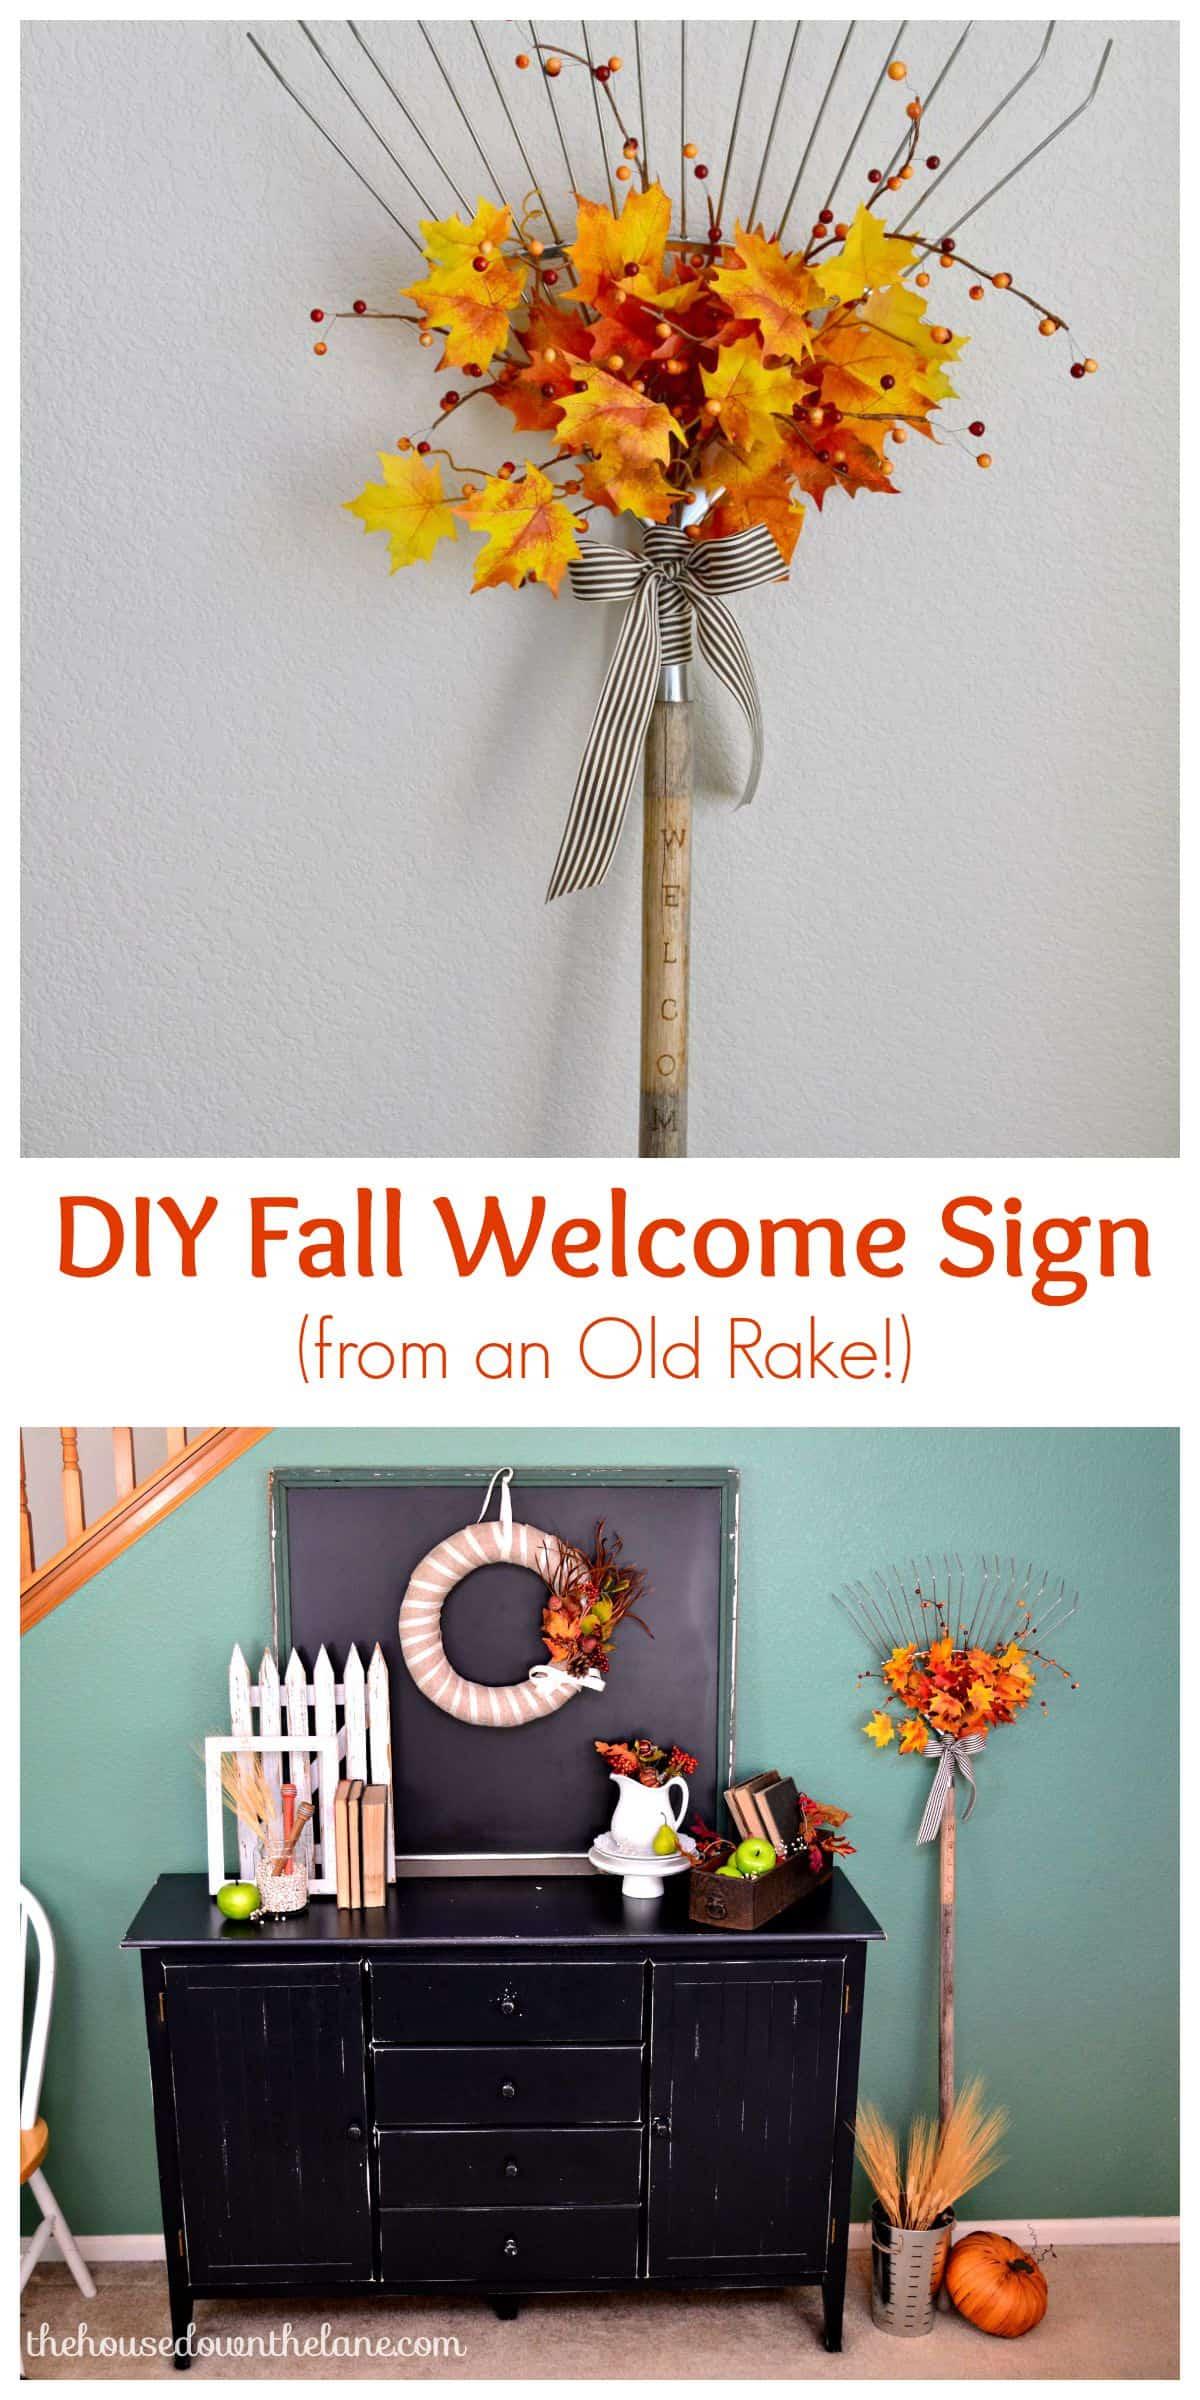 Fall rake welcome sign